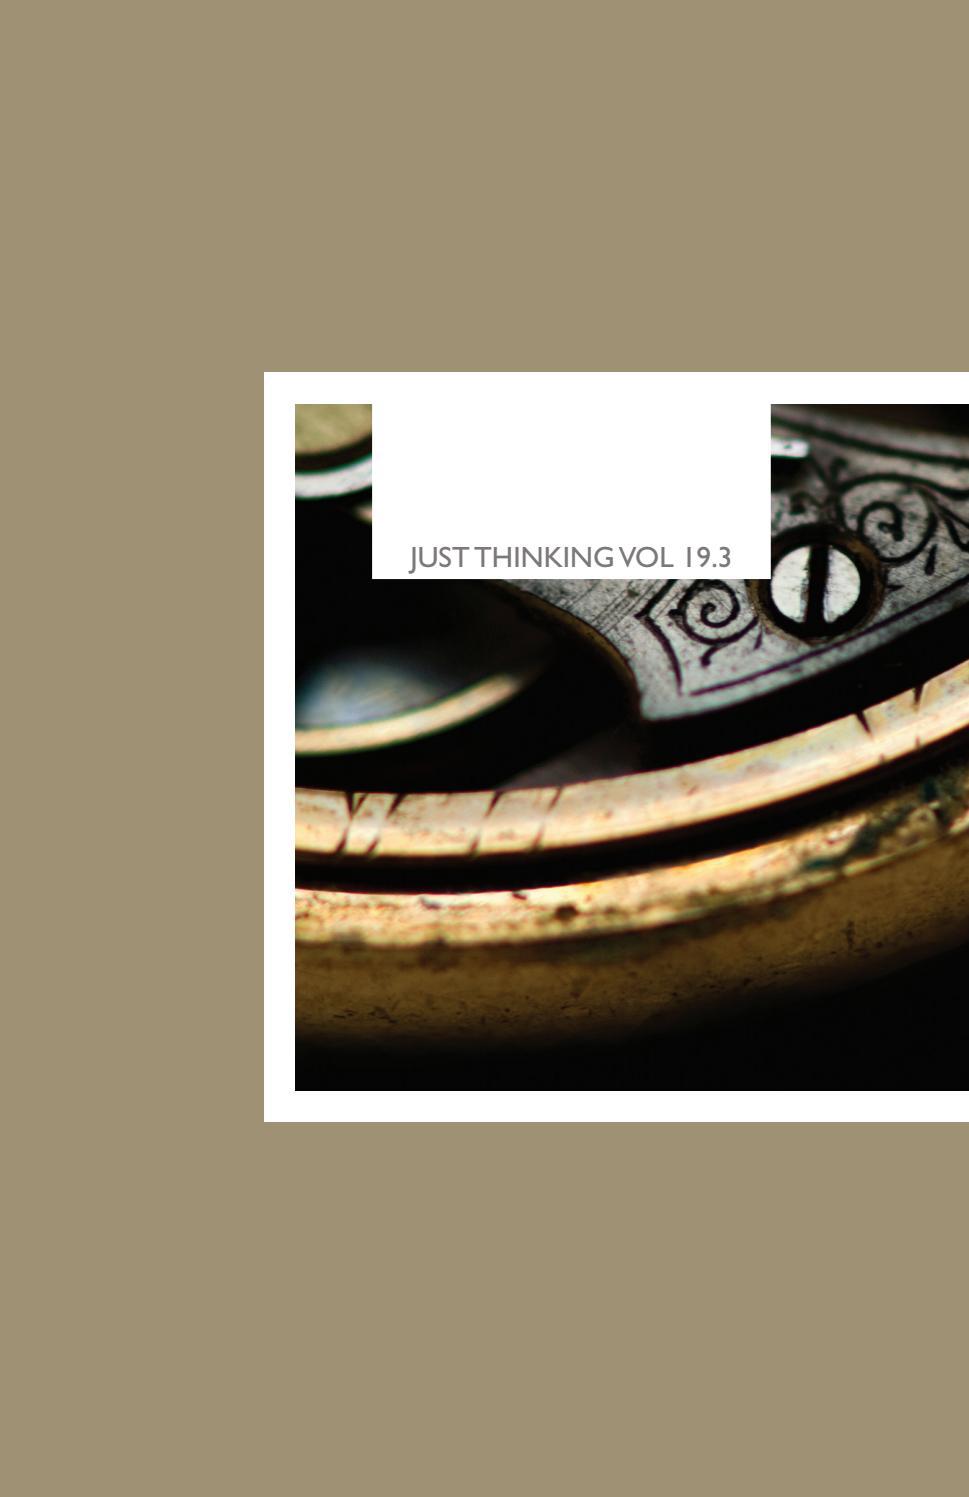 Just Thinking Vol  19 3 by James Balgalore - issuu